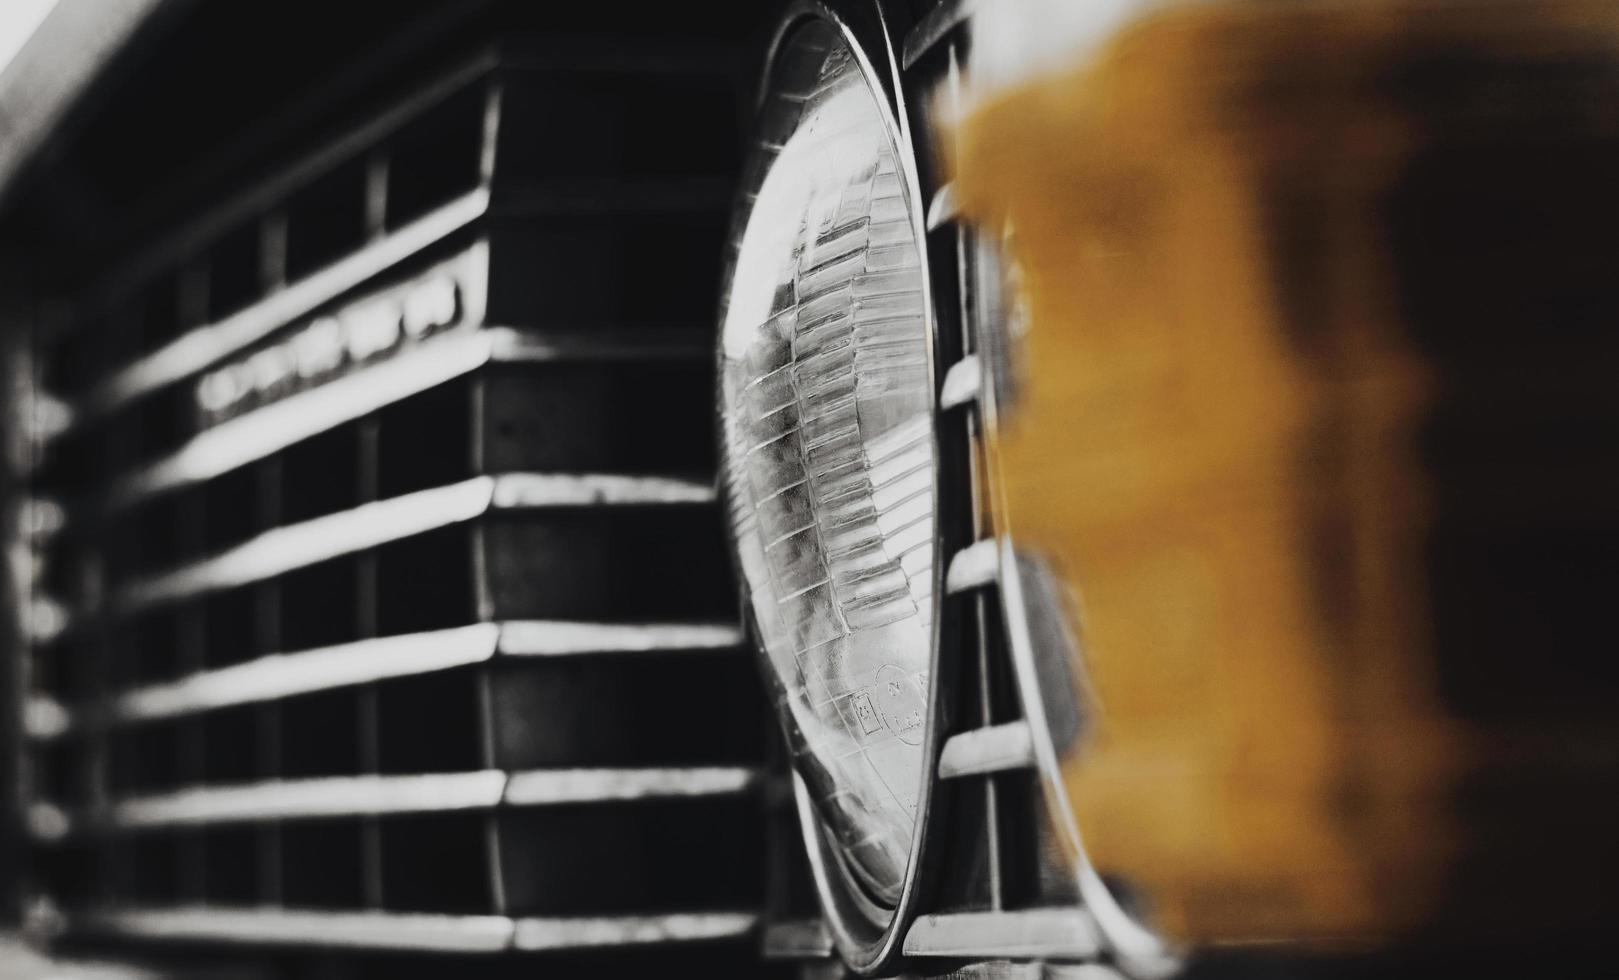 Details of a classic vintage car  photo